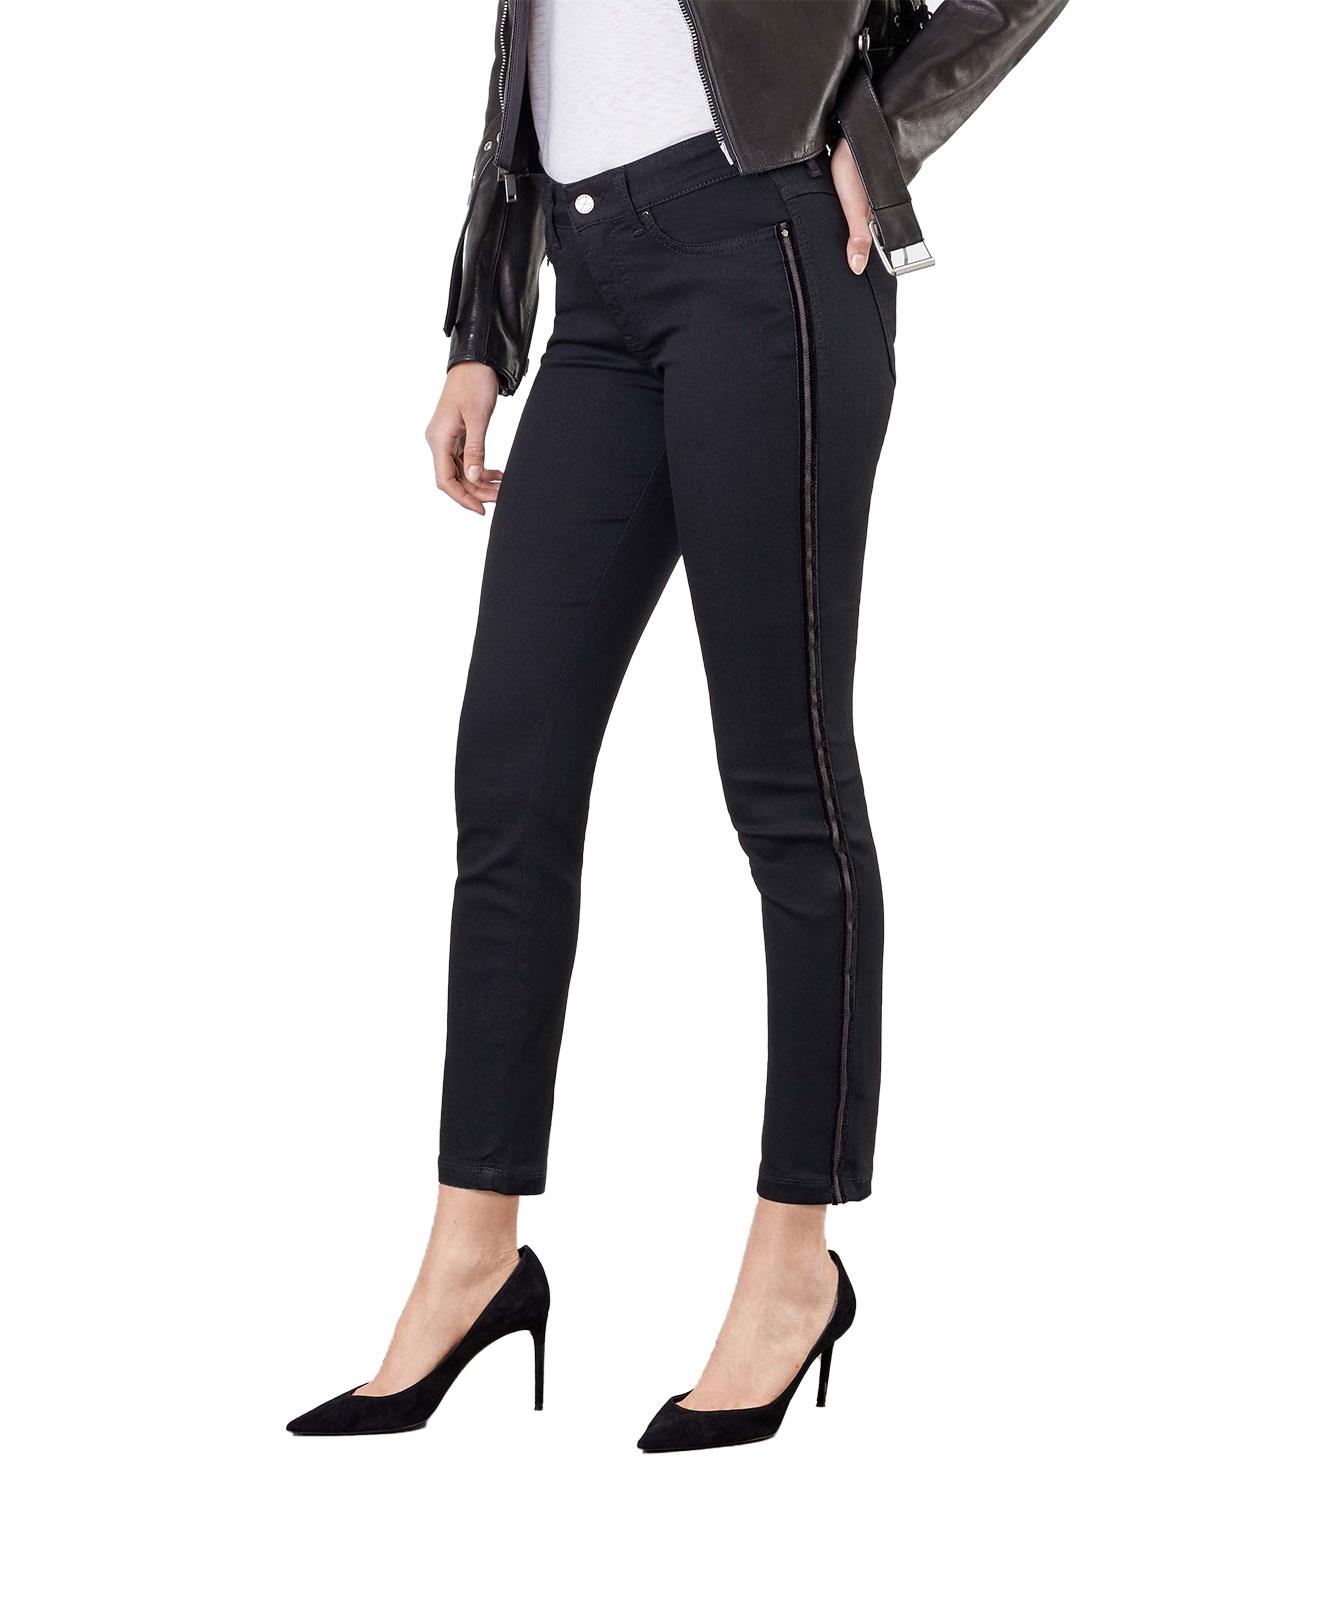 Hosen - MAC Ankle Jeans Dream Slim Velevet Galloon in Black Black  - Onlineshop Jeans Meile